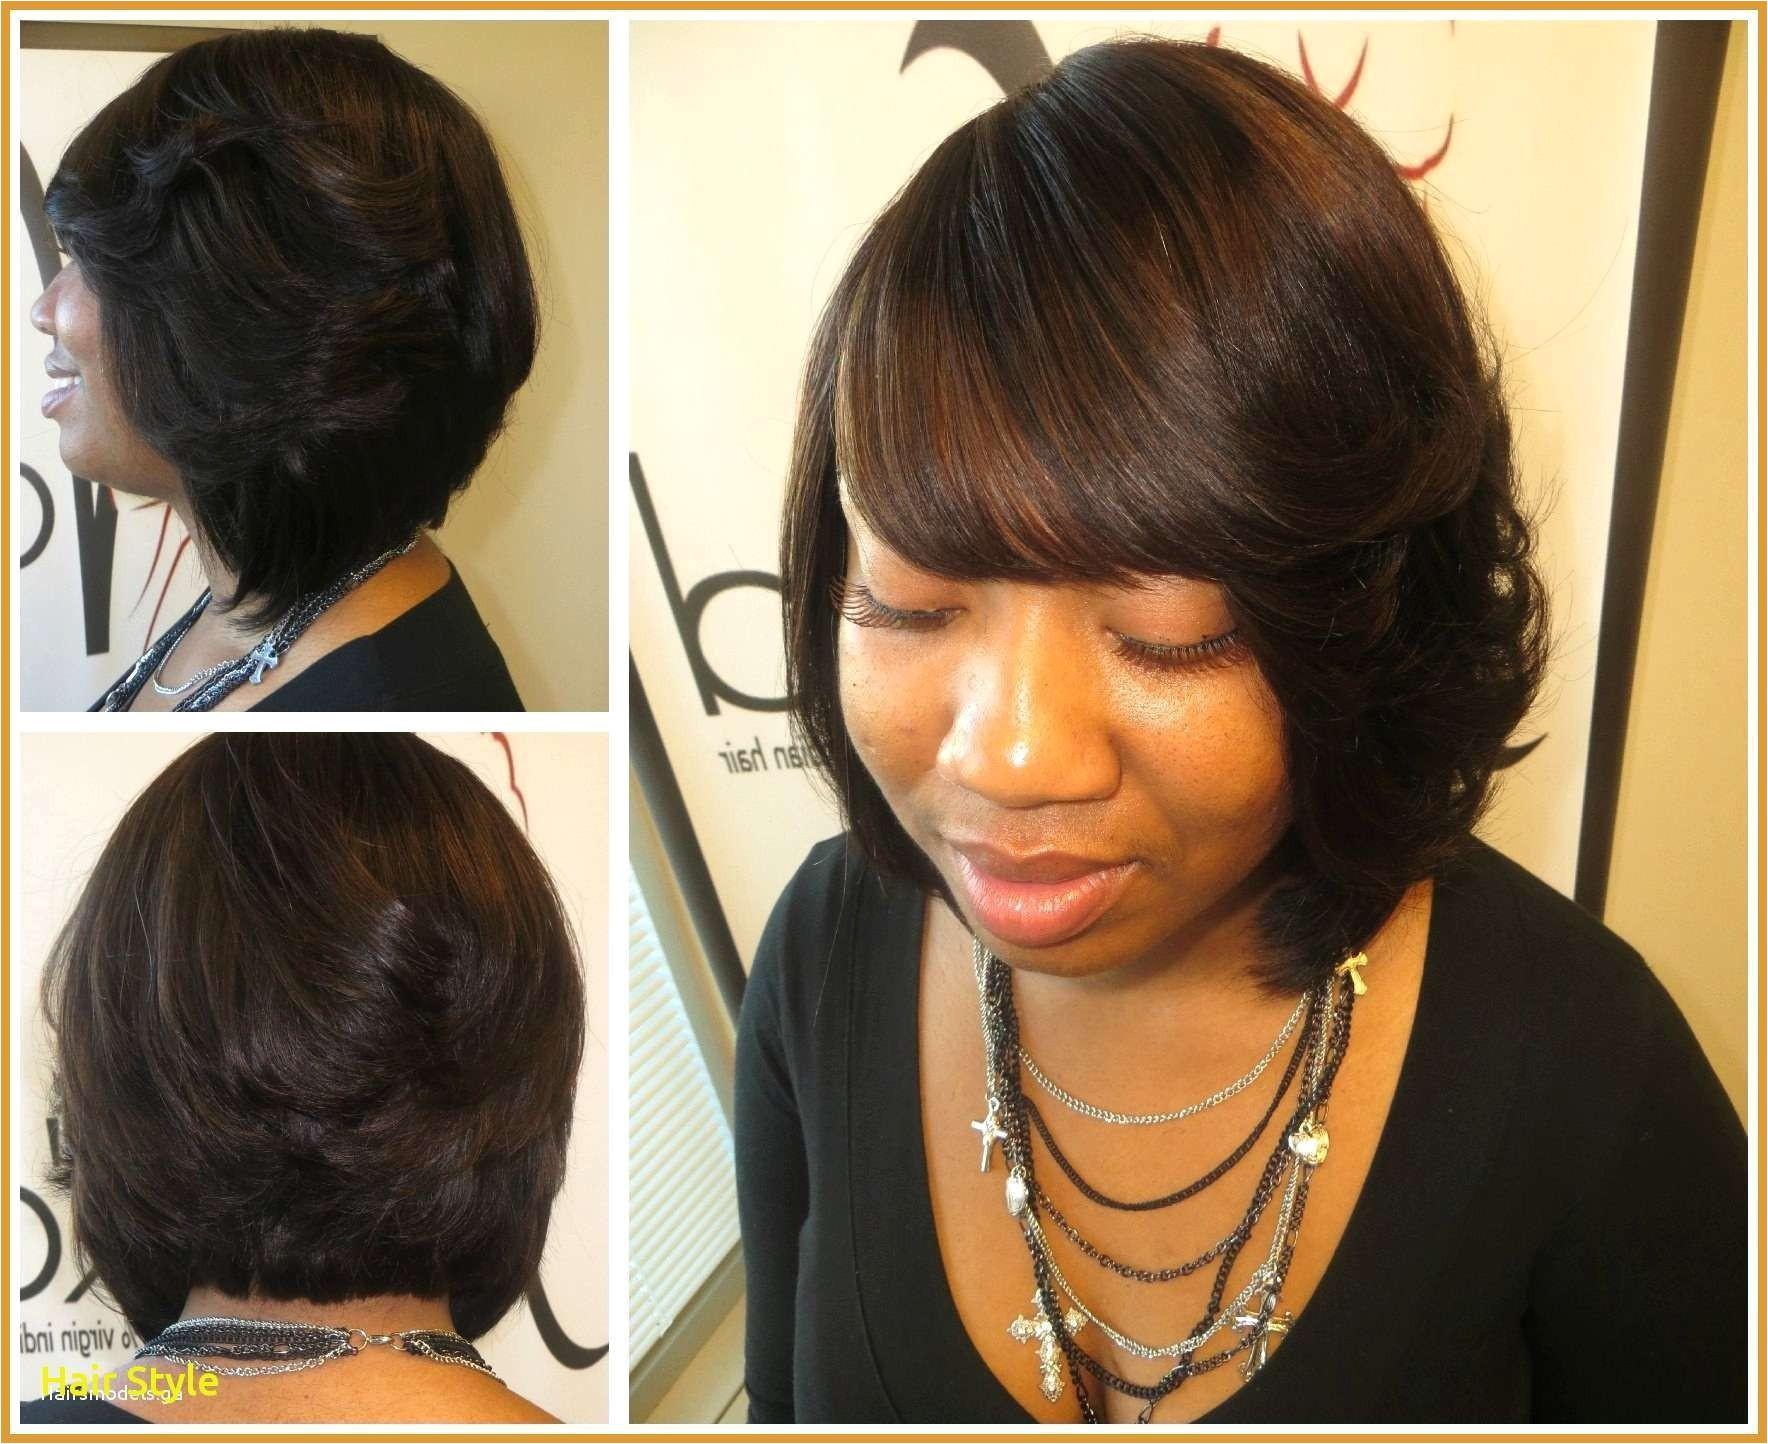 Medium Short Hairstyles For Girls Unique Short Bob Hairstyles 7161 Cute Hairstyles For Medium Short Hair